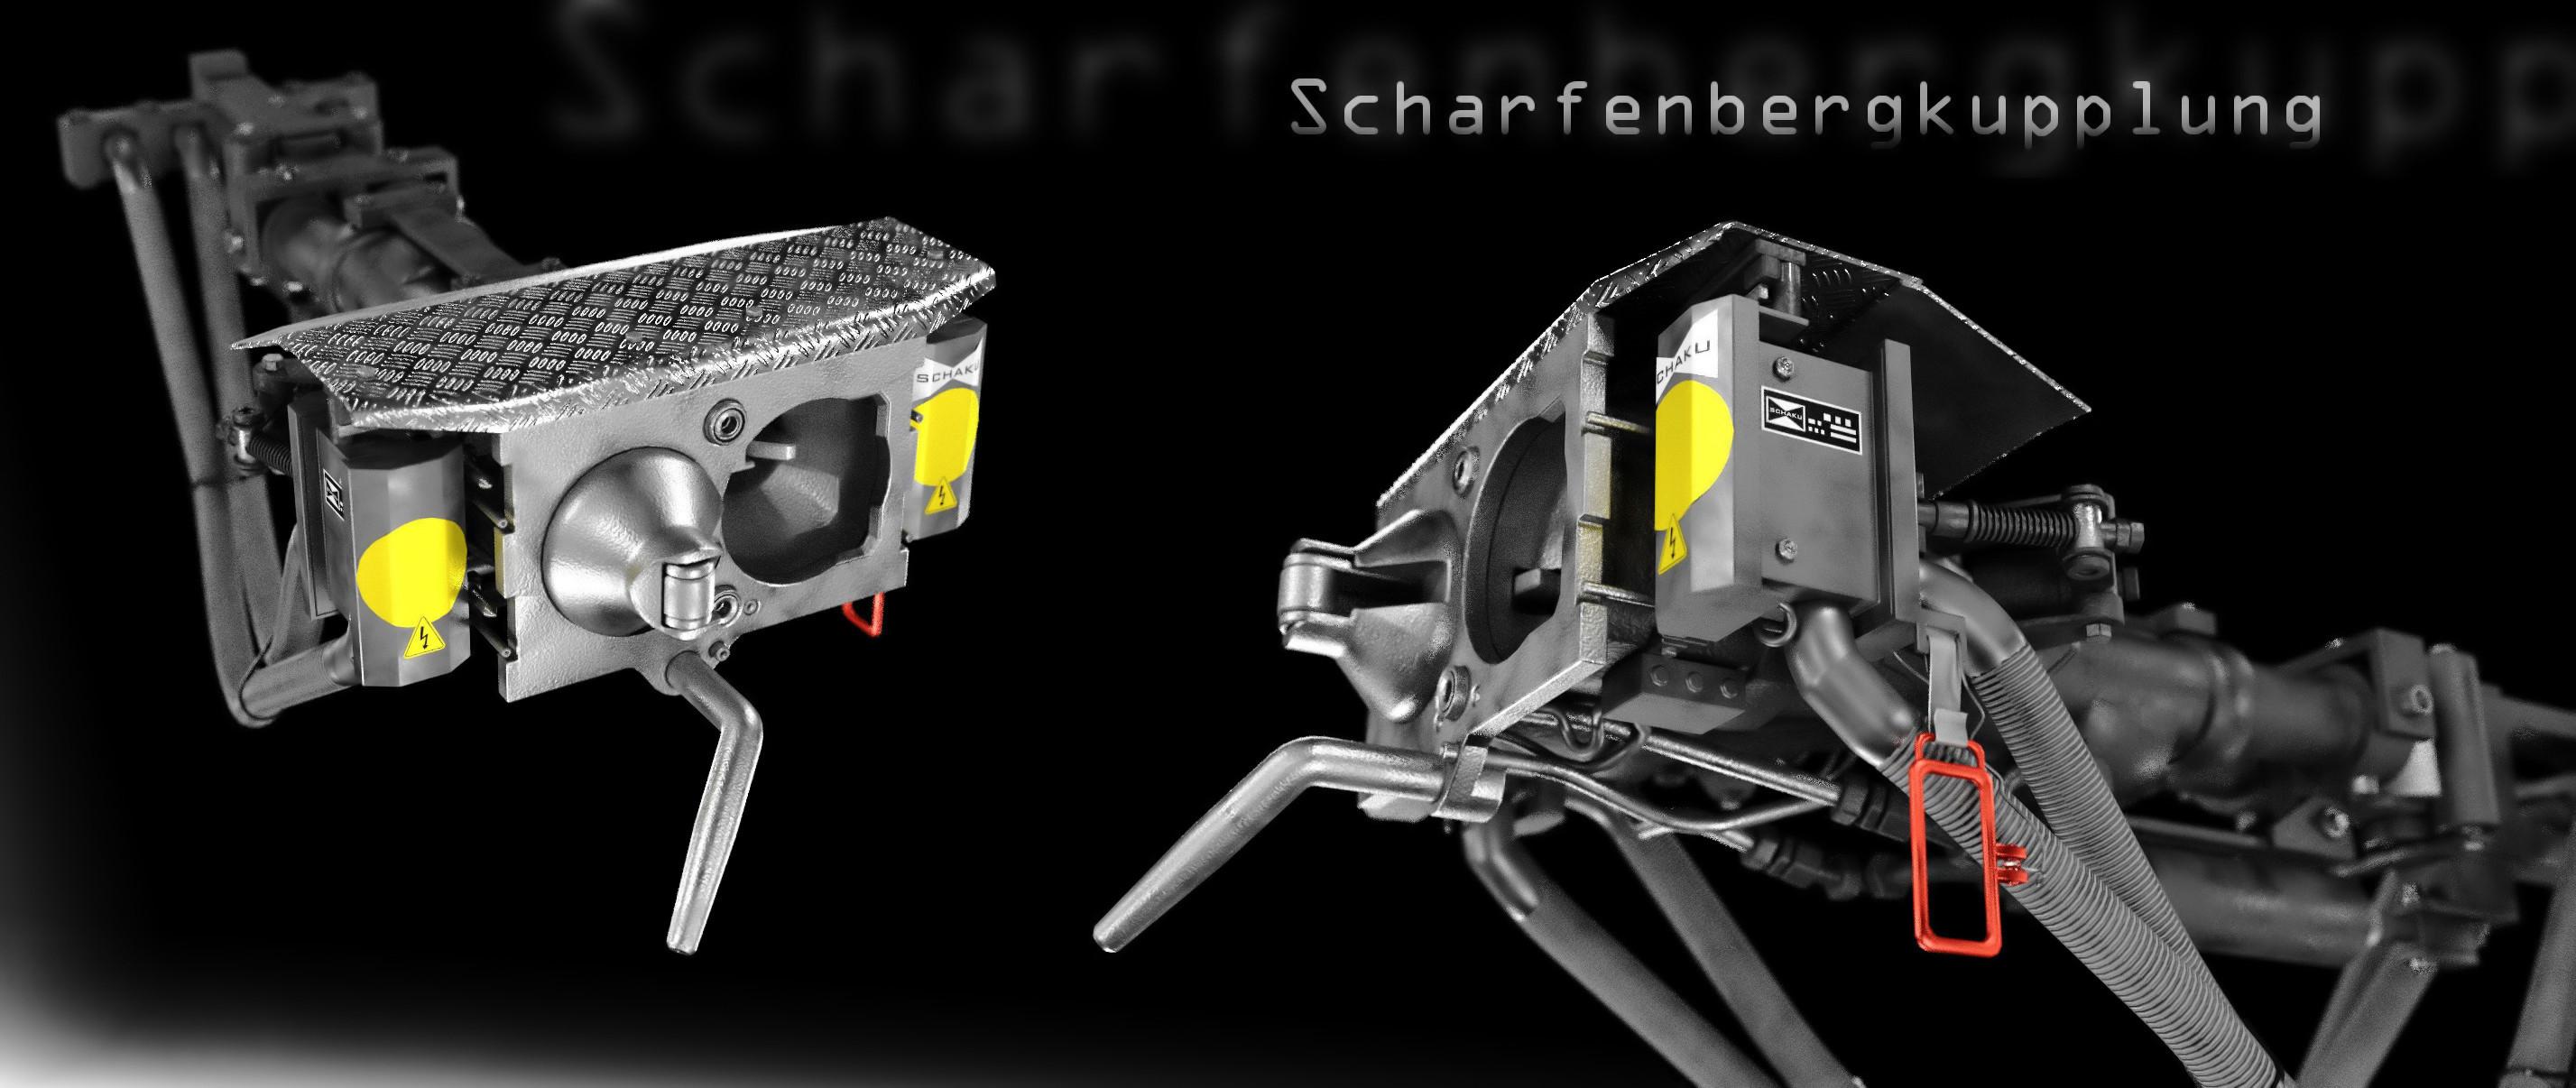 S-Bahn_Schaku_-_Composite